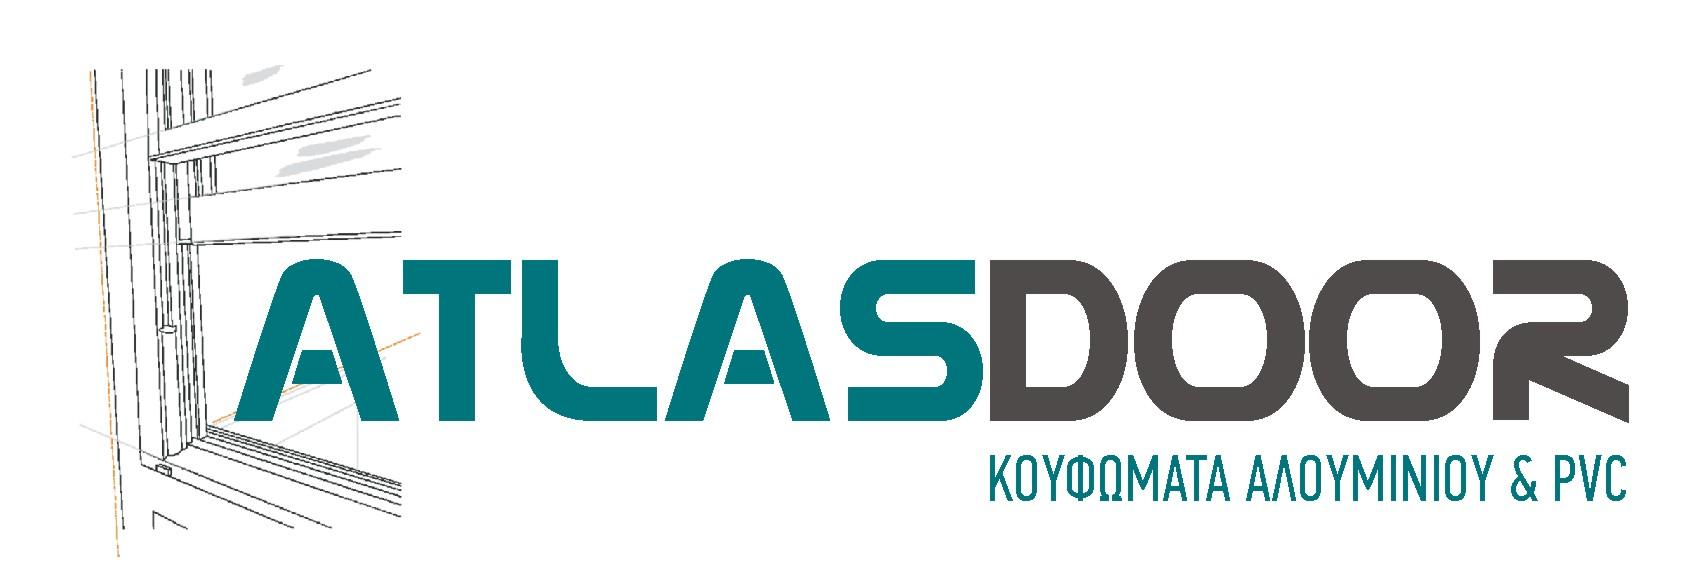 Atlasdoor - Κουφώματα Αλουμινίου & PVC